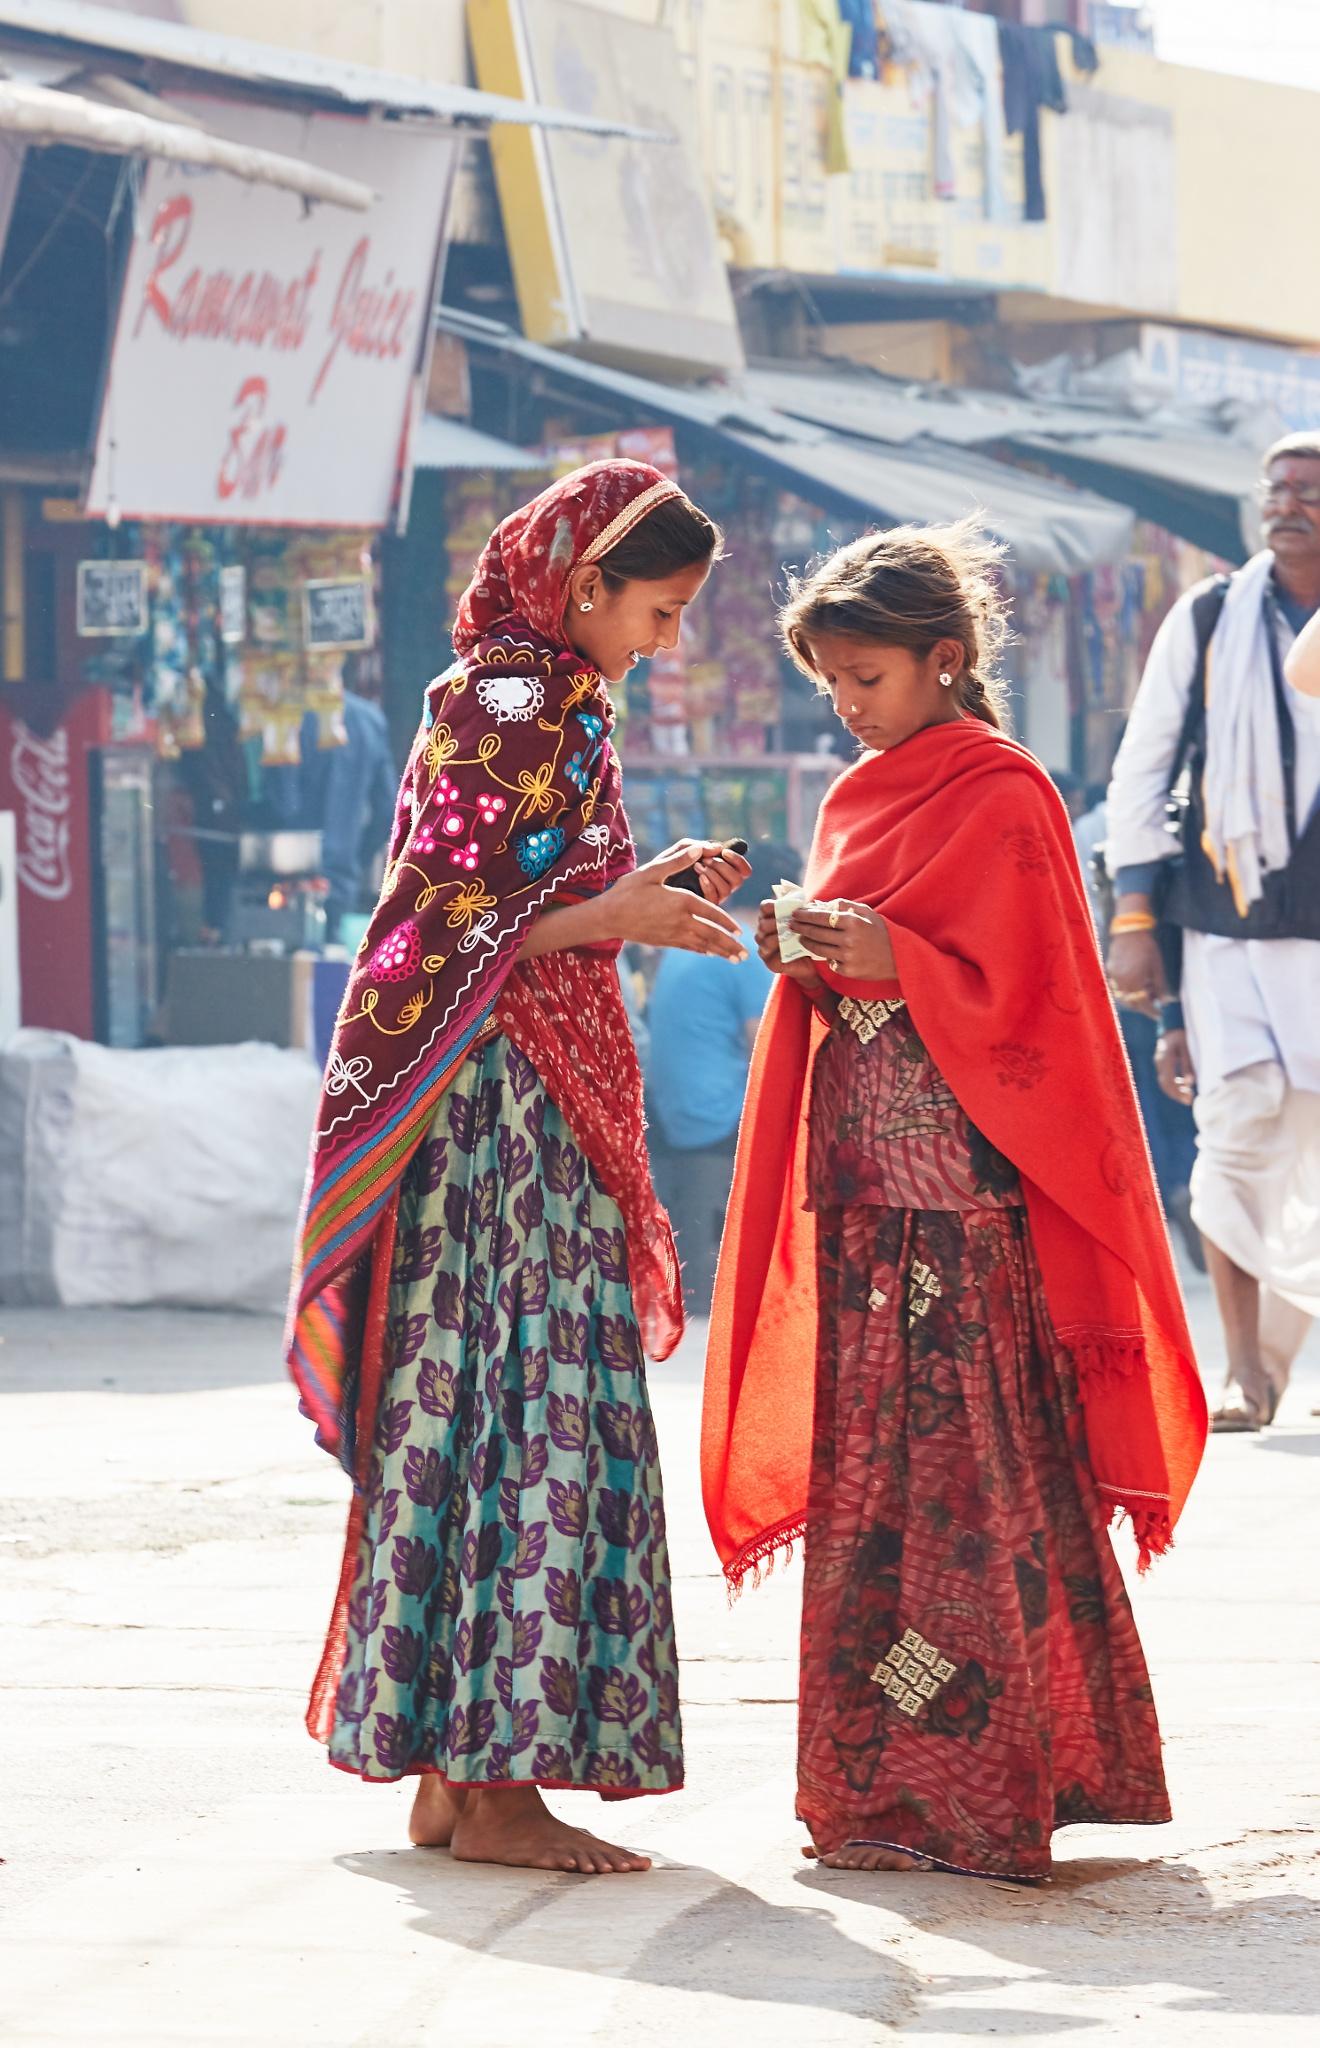 Pushkar, India street shot 011 by PatrickLeeKKAh9